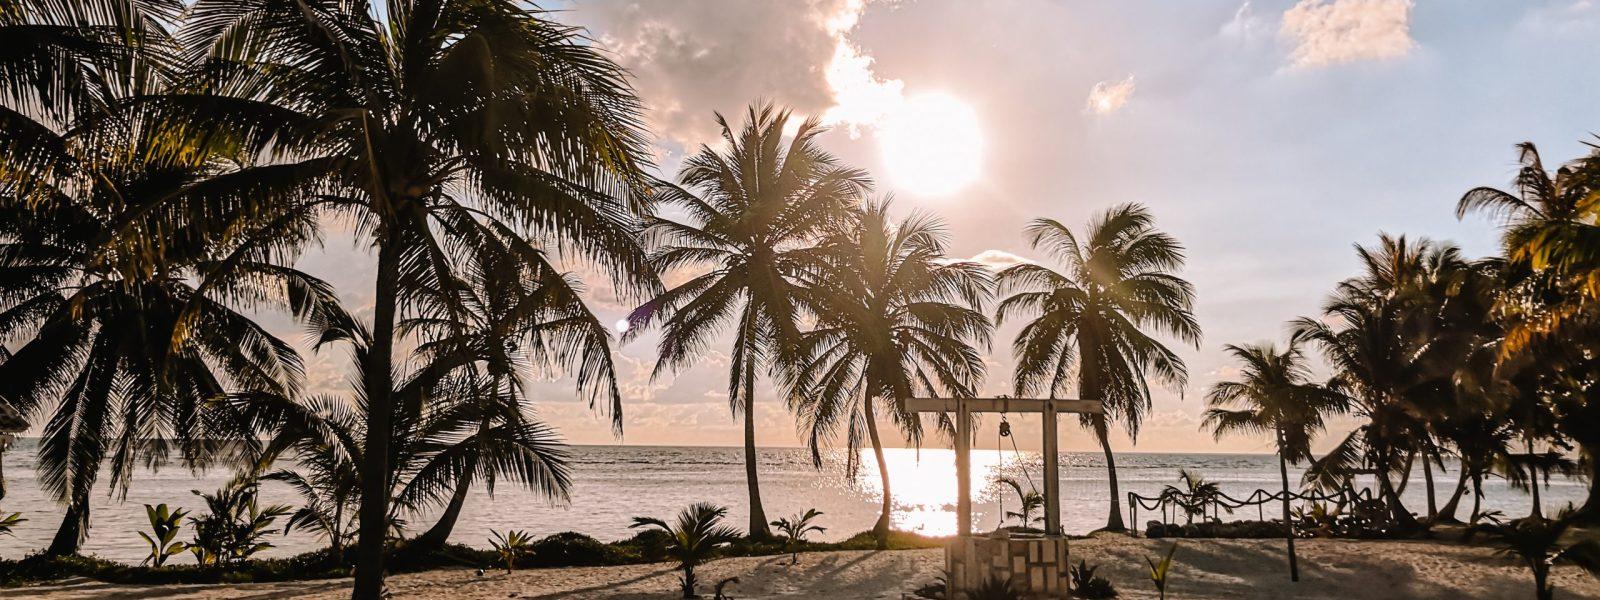 De perfecte Airbnb bij Mahahual: uniek strandparadijs in Mexico